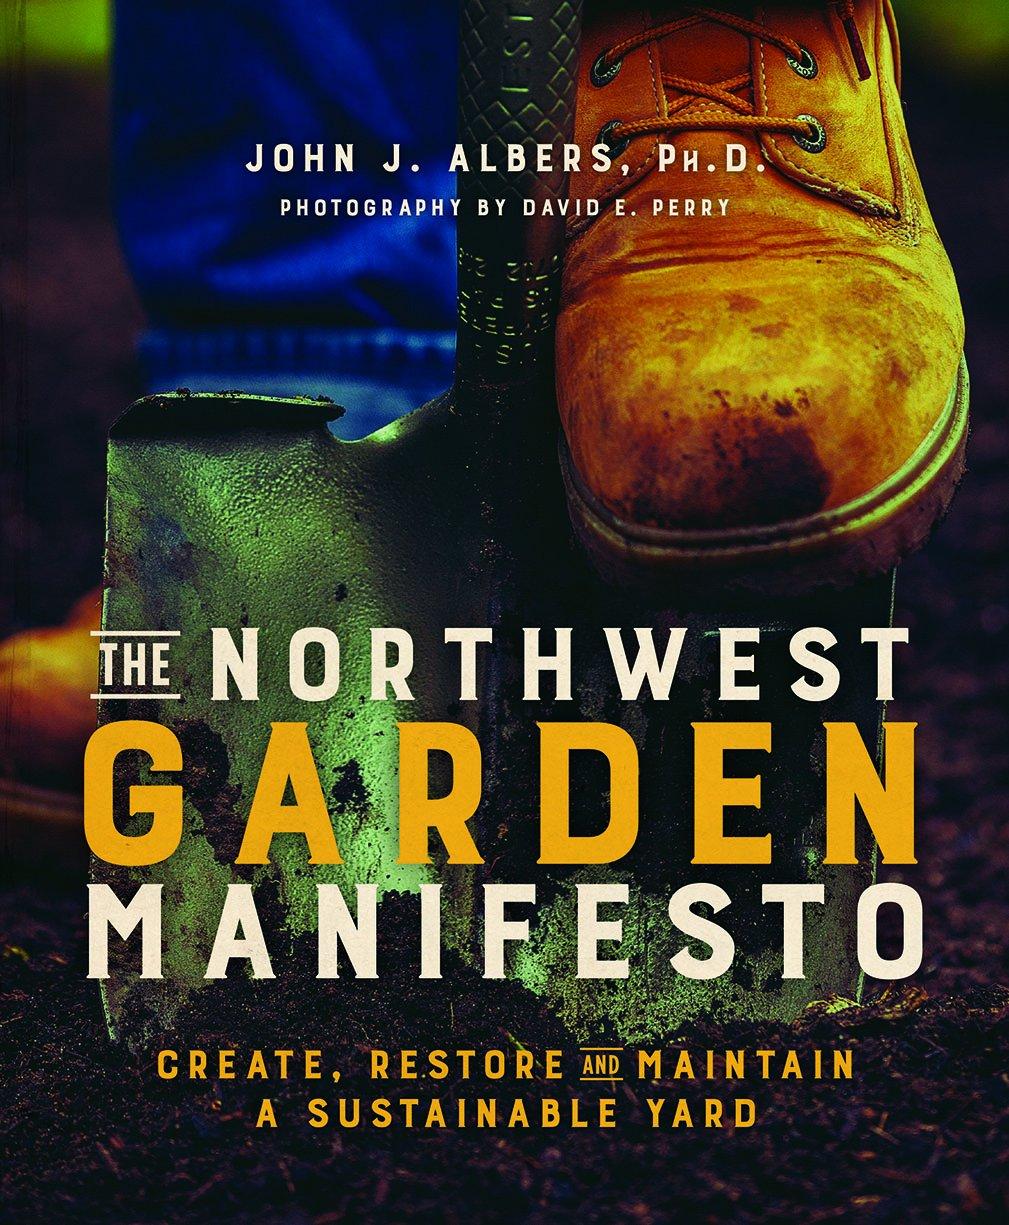 The Northwest Garden Manifesto: Create, Restore and Maintain a Sustainable Yard